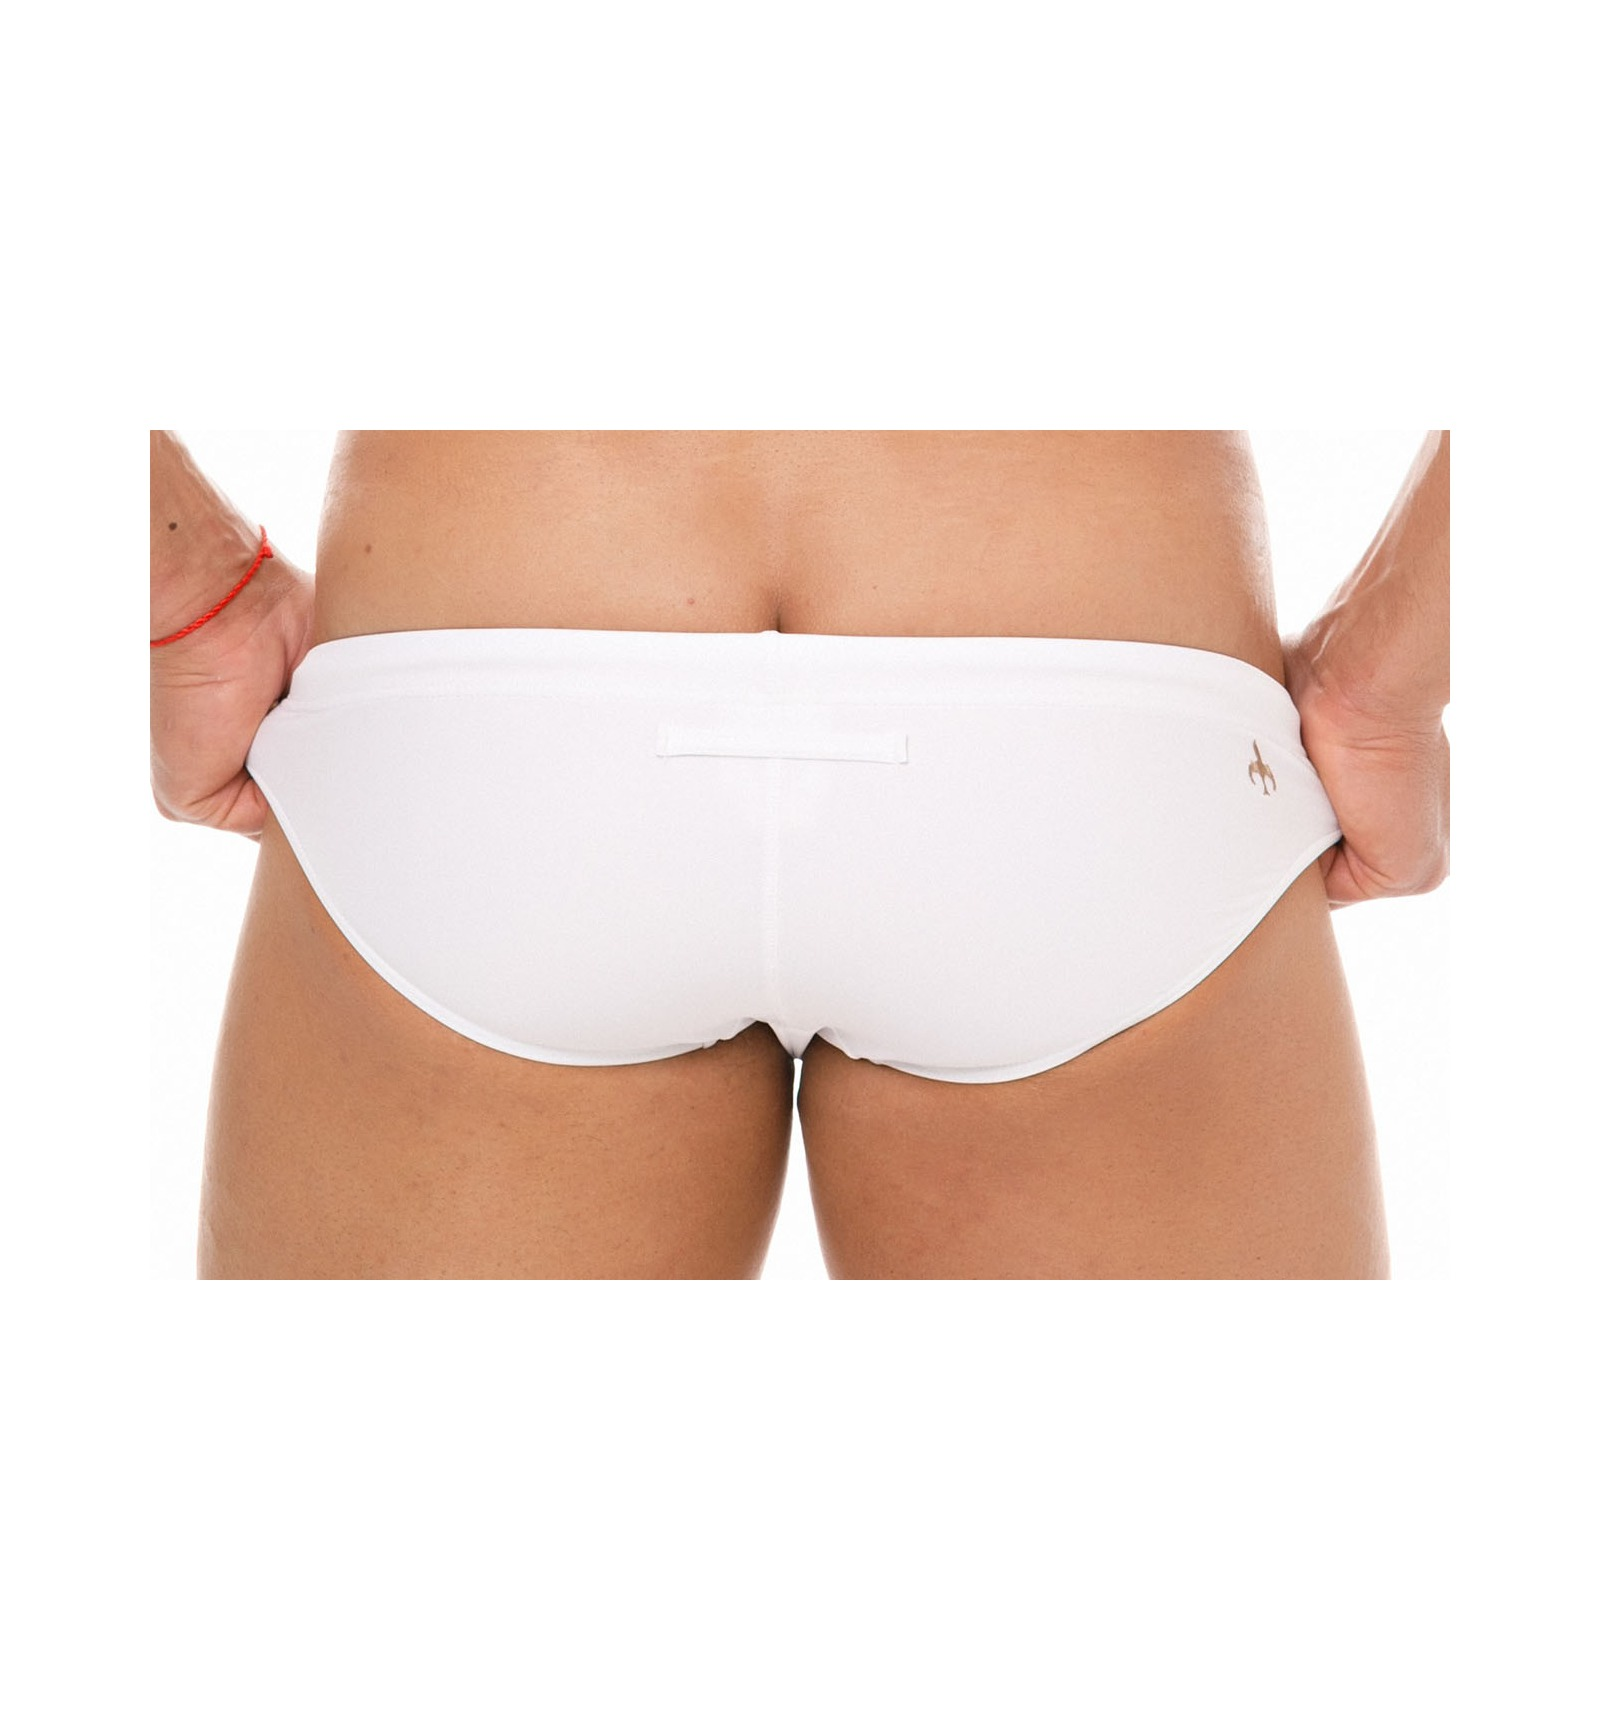 Marcuse Swimwear Risqué White